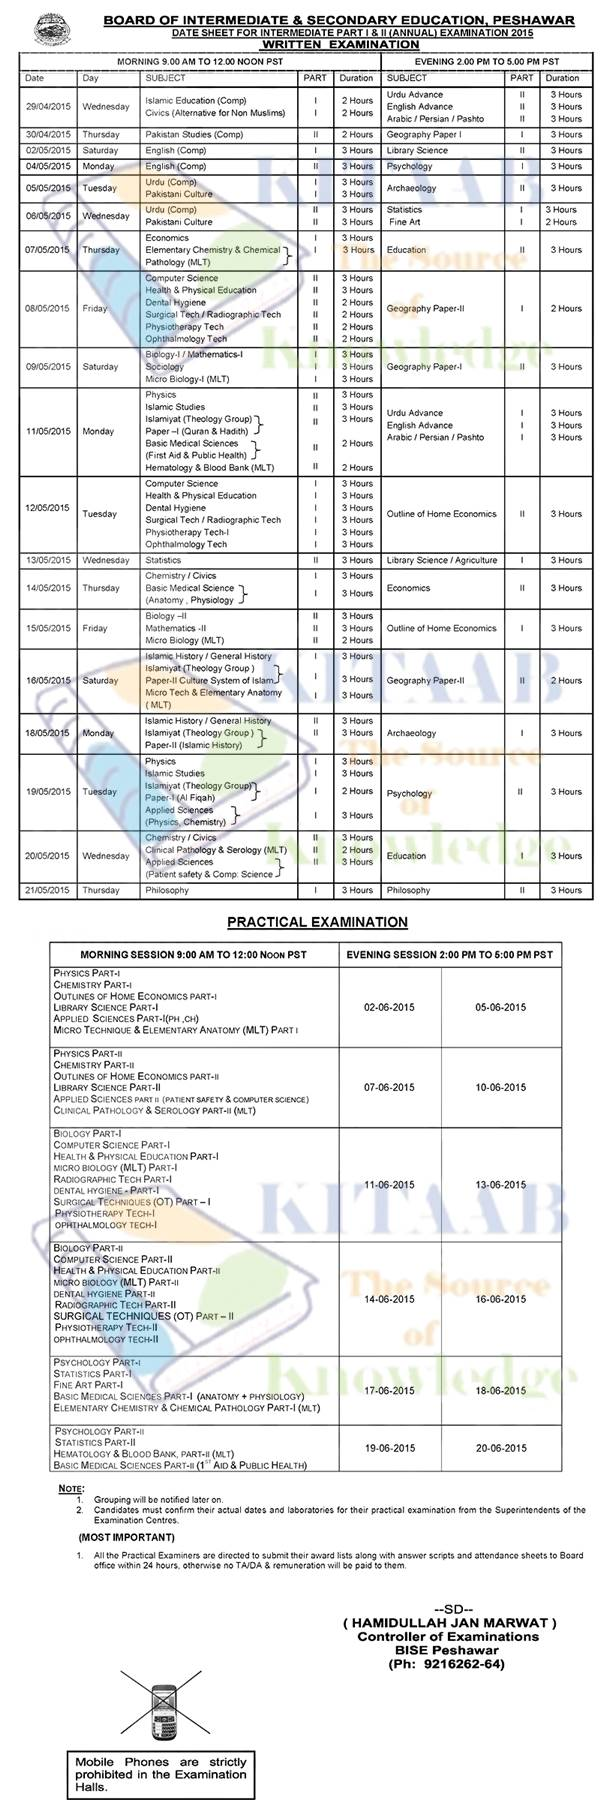 2015 datesheet 12 Date sheet matric, march-2018 batch 2015-2017 date sheet jbt part part-ii(re-appear), batch 2013-2015 other links press gallery allied.